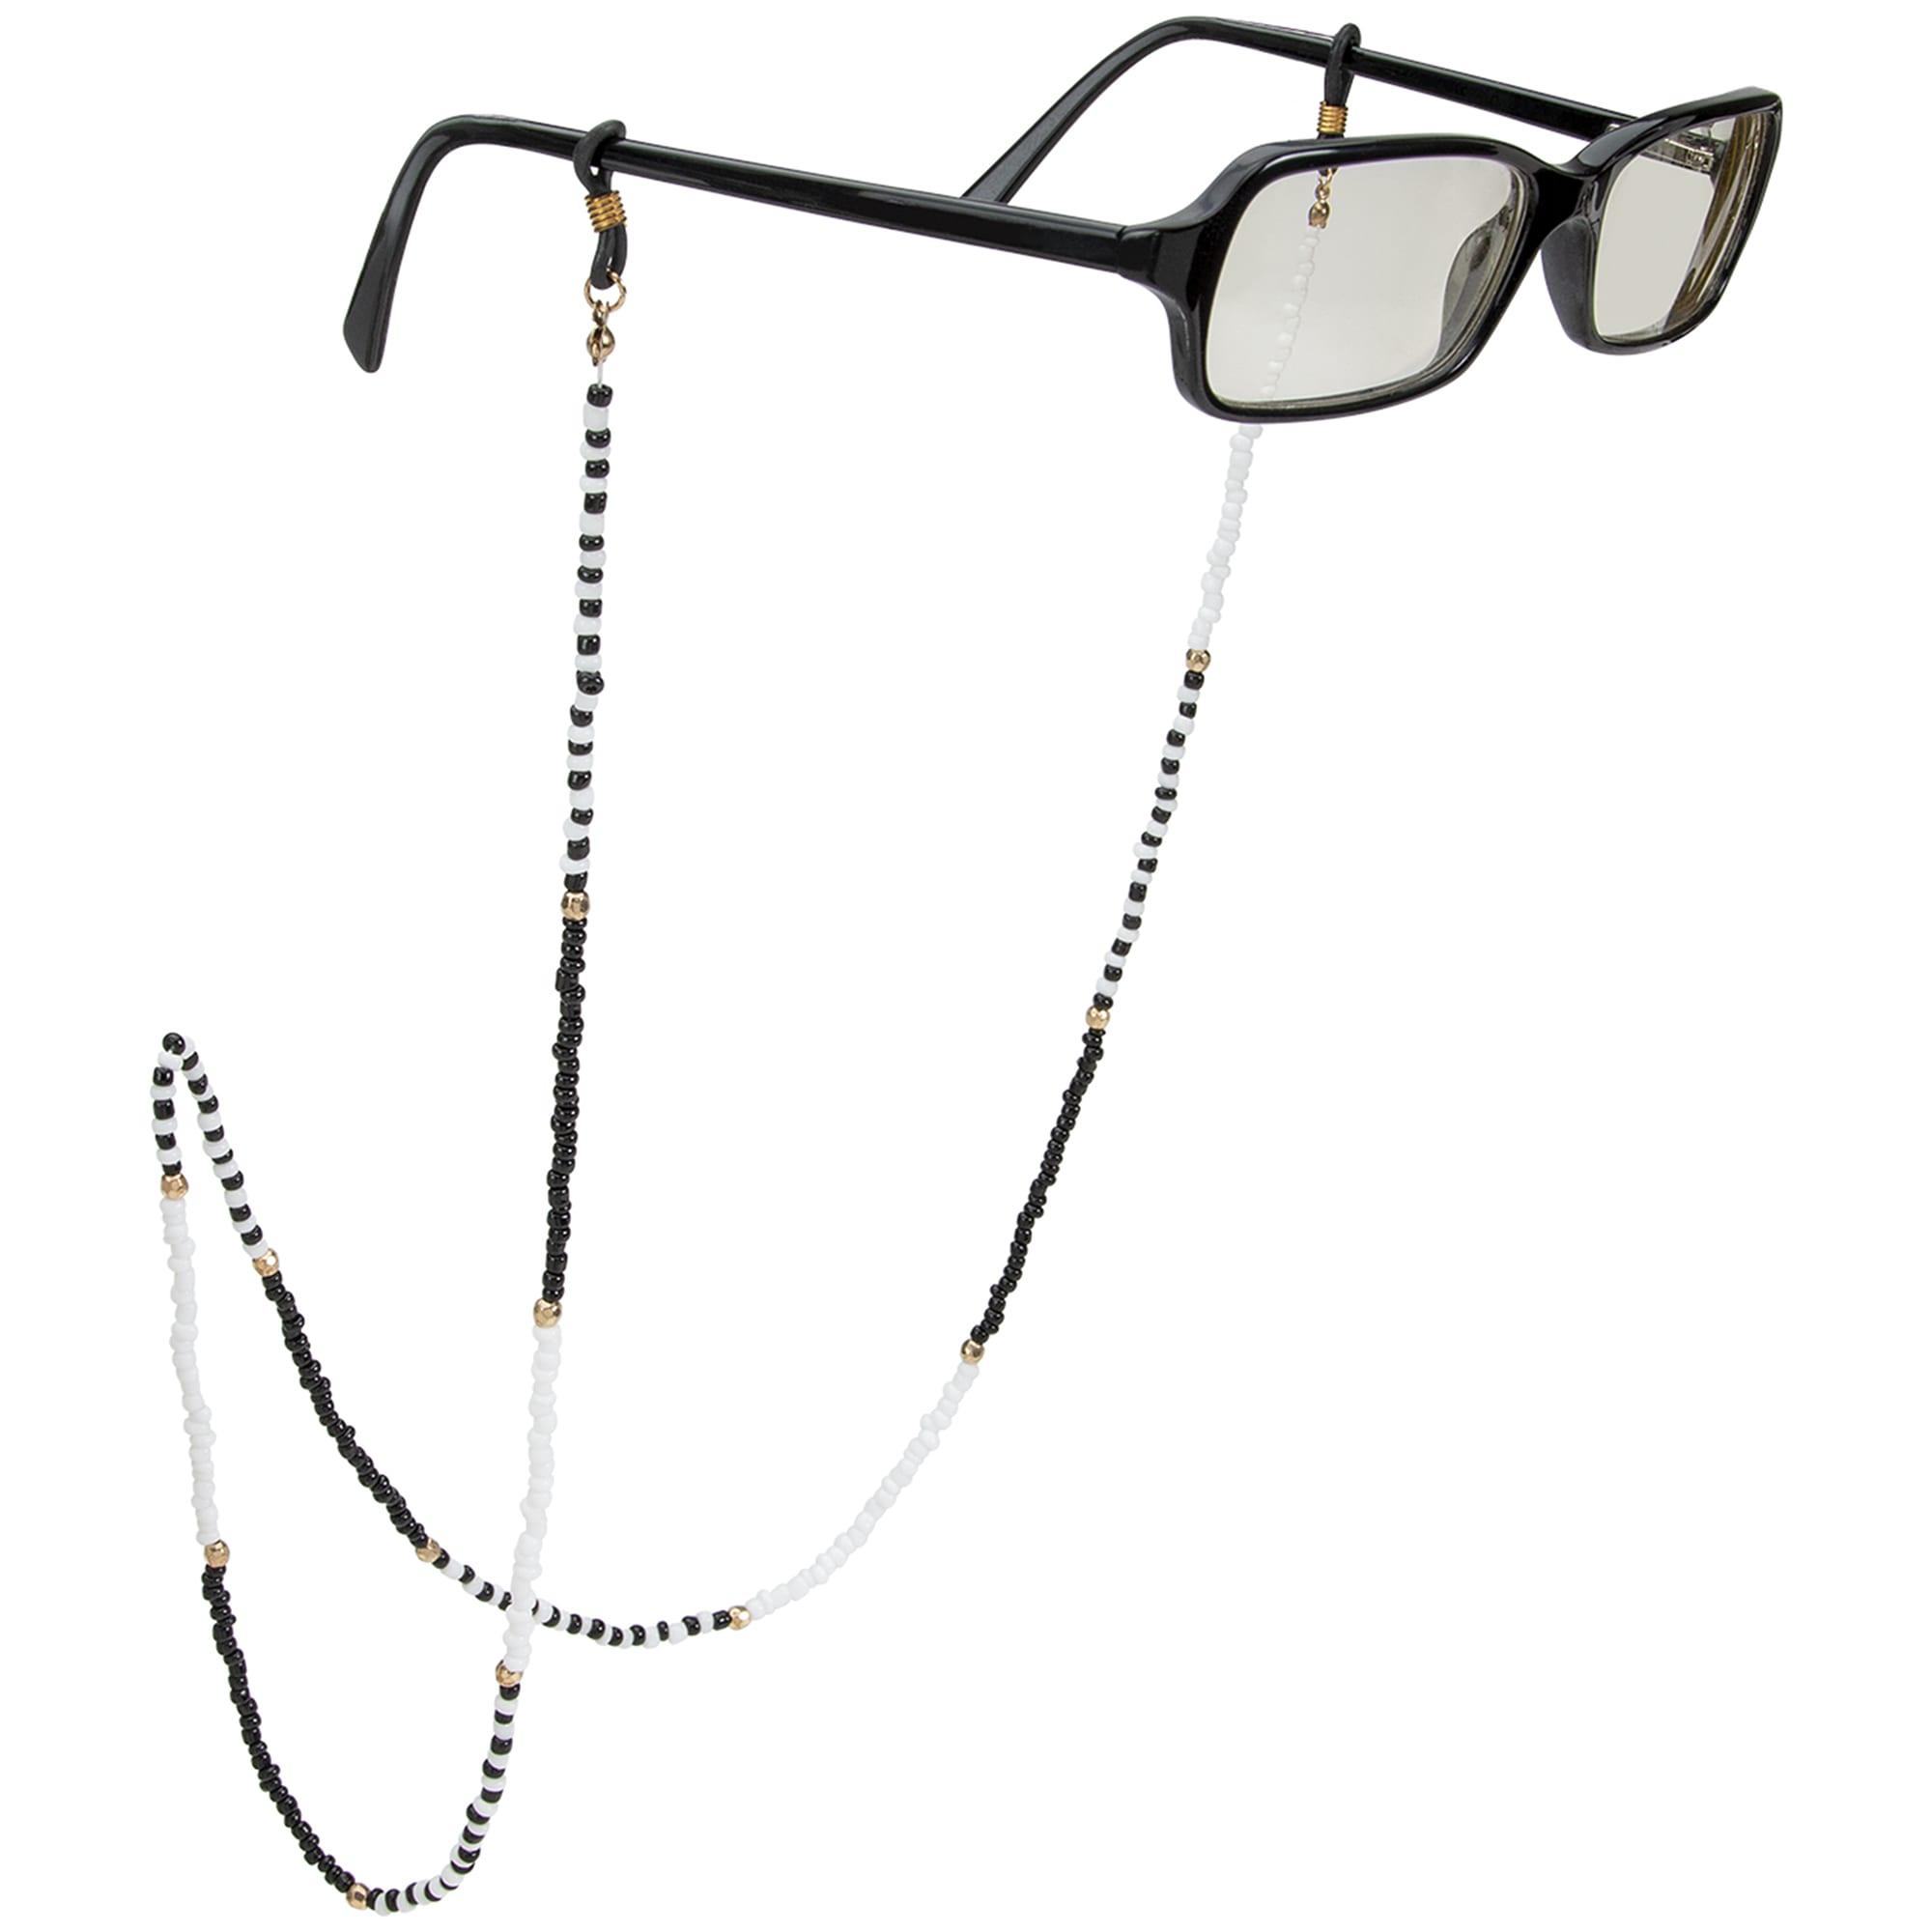 Black and White Beaded Eyeglass/Sunglass Retainer - Black/White - Front